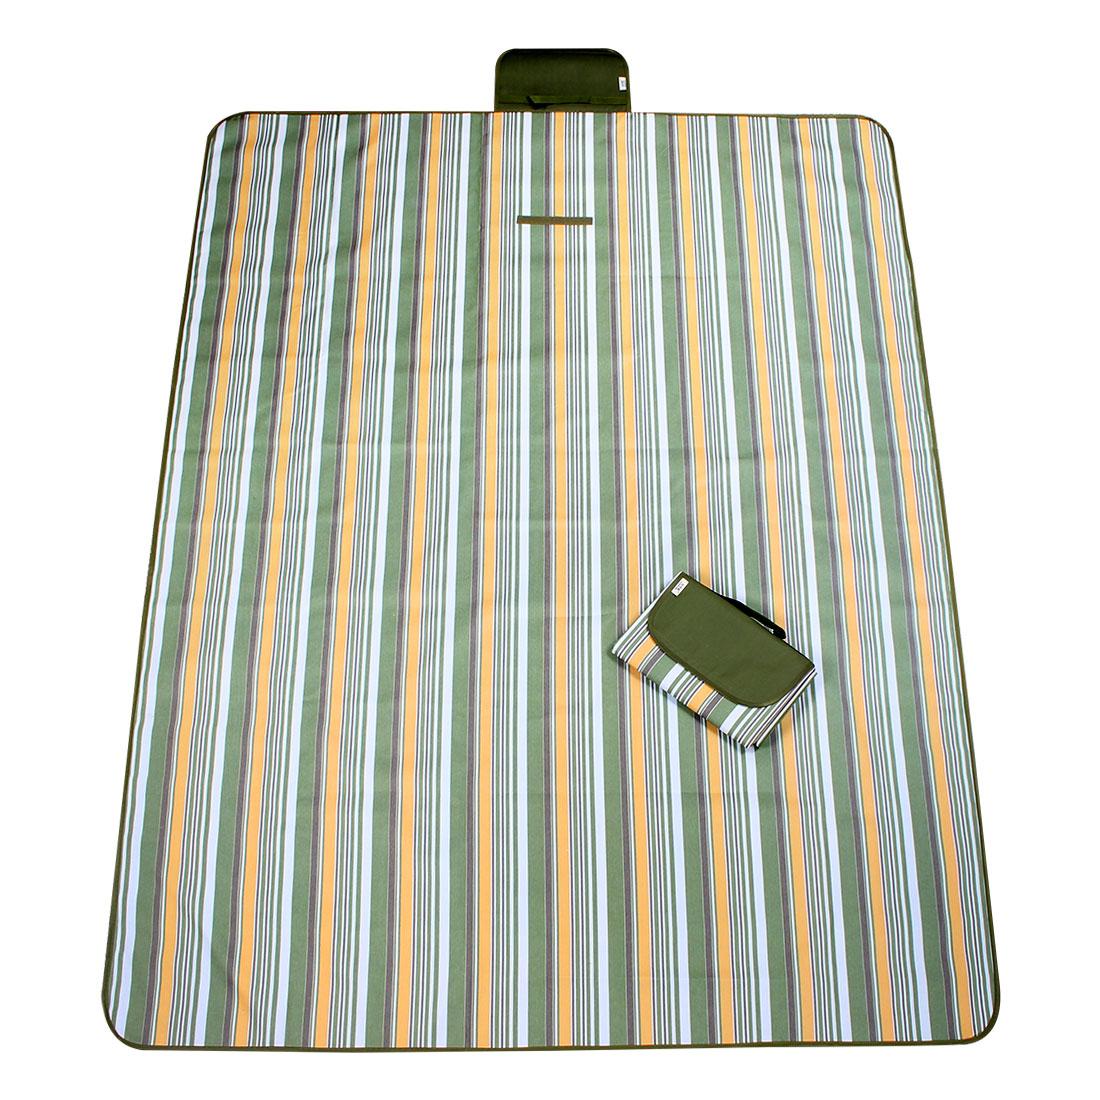 Outdoor Hiking Camping Nylon Stripe Pattern Picnic Mat Army Green 145 x 180cm